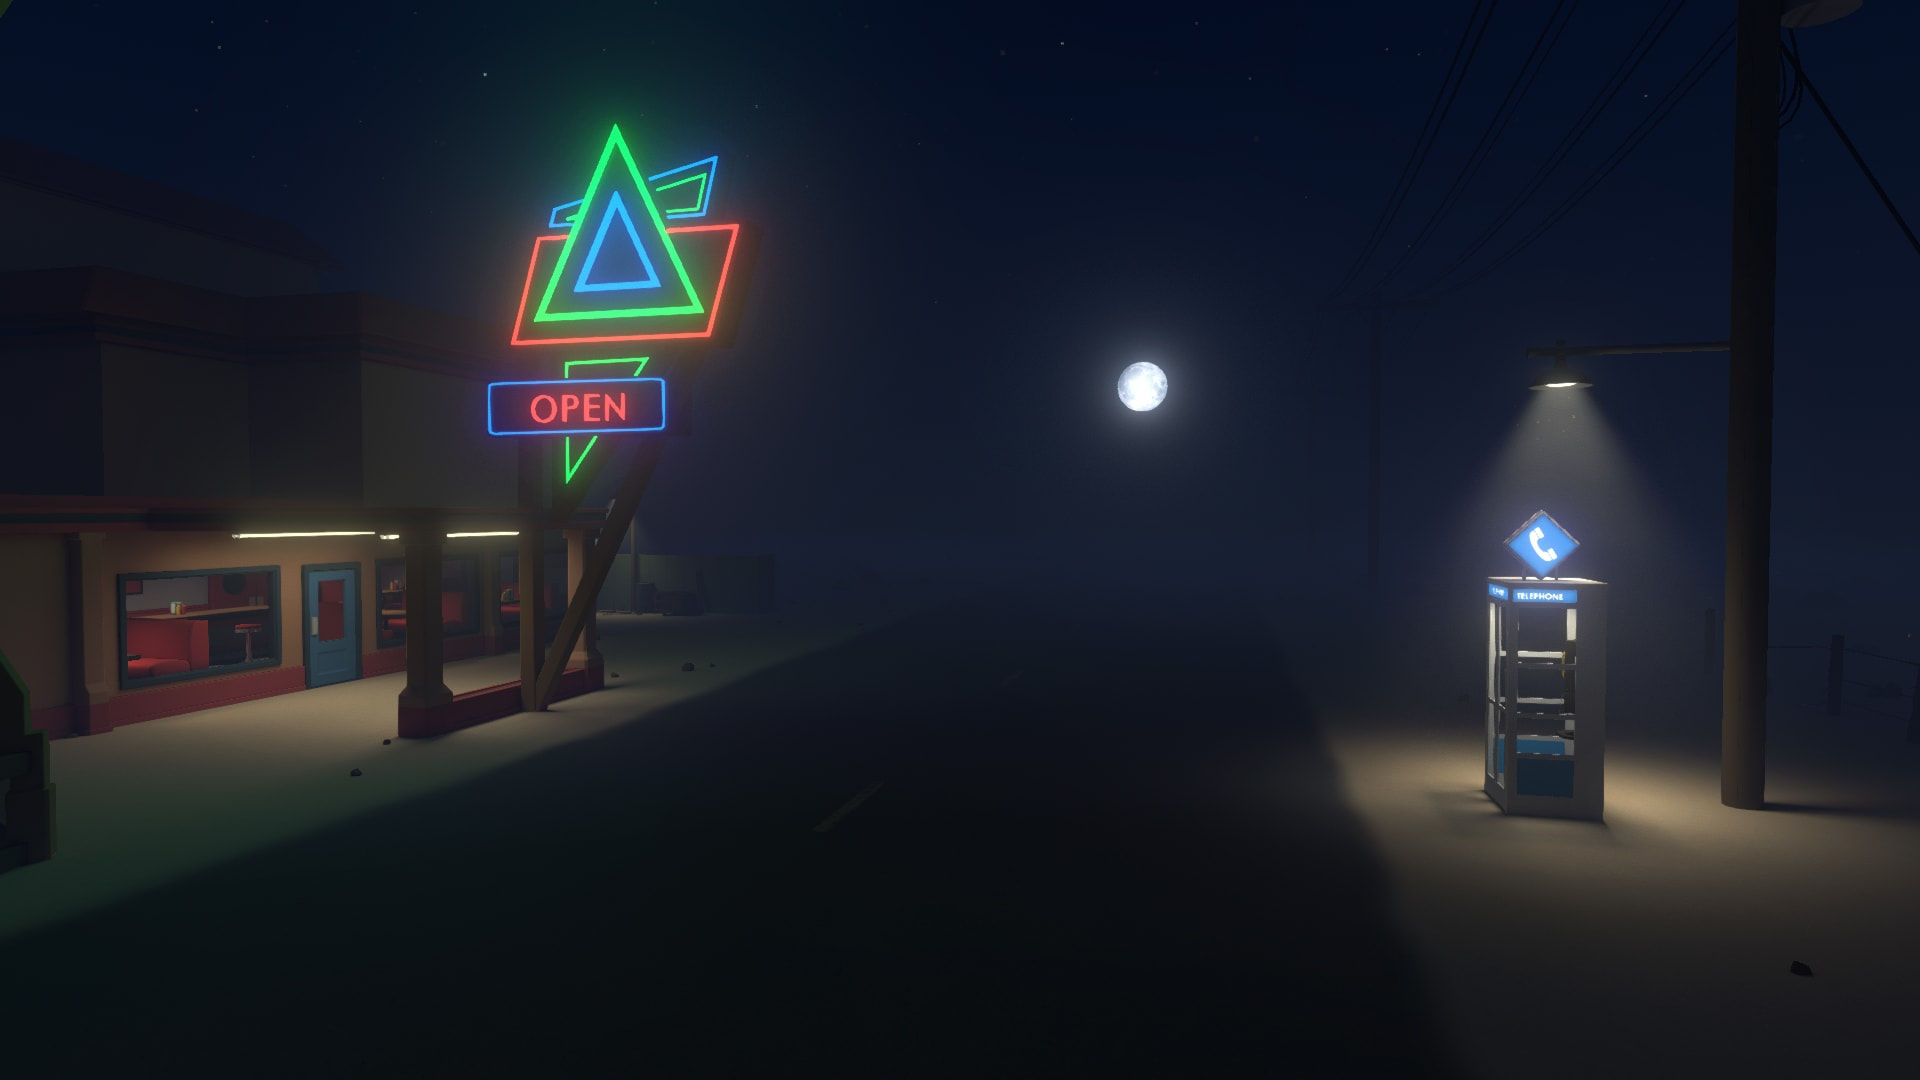 Discolored game roadside diner